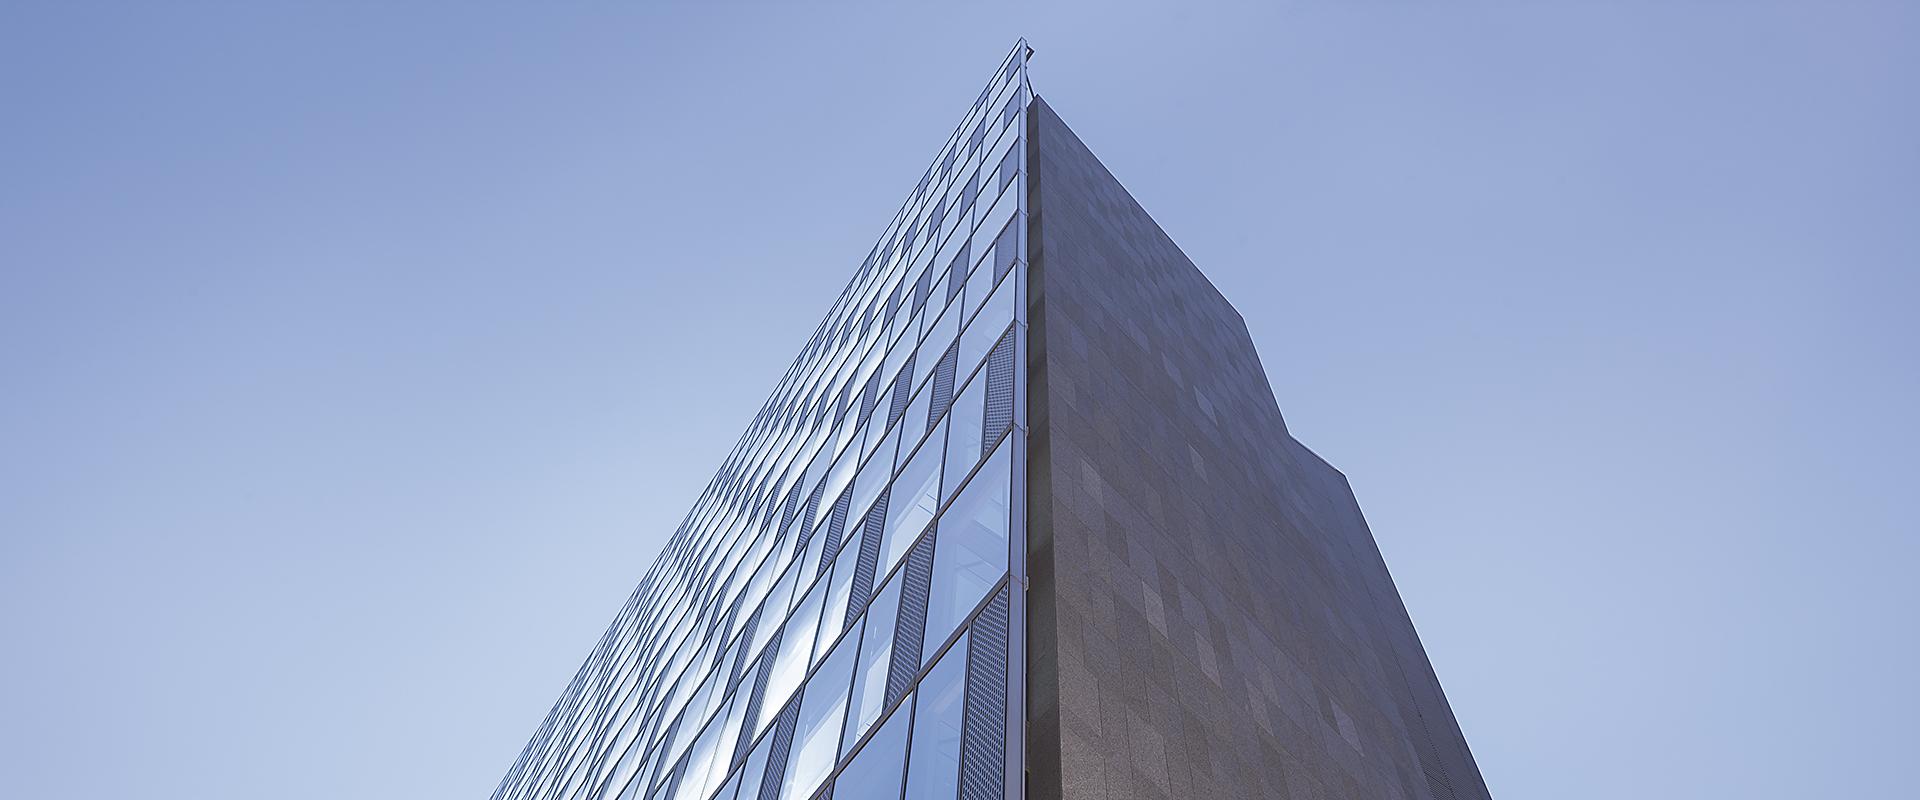 gad建筑设计创建于1997年,发展至今已拥有各类专业设计人员约1000余人,具有建筑行业建筑工程甲级资质,是集建筑工程设计、工程技术咨询 及服务为一体的综合型设计机构。项目涵盖住宅、写字楼、酒店、科研、大专院校、商业、城市综合体等, 并相继在杭州、上海、青岛、厦门、重庆成立了设计公司。gad致力于追求将客户的商业价值和设计师的建筑理想完美结合, 以精致的设计风格和充满人文关怀的设计思想,成为现代中国建筑设计的品牌设计企业。